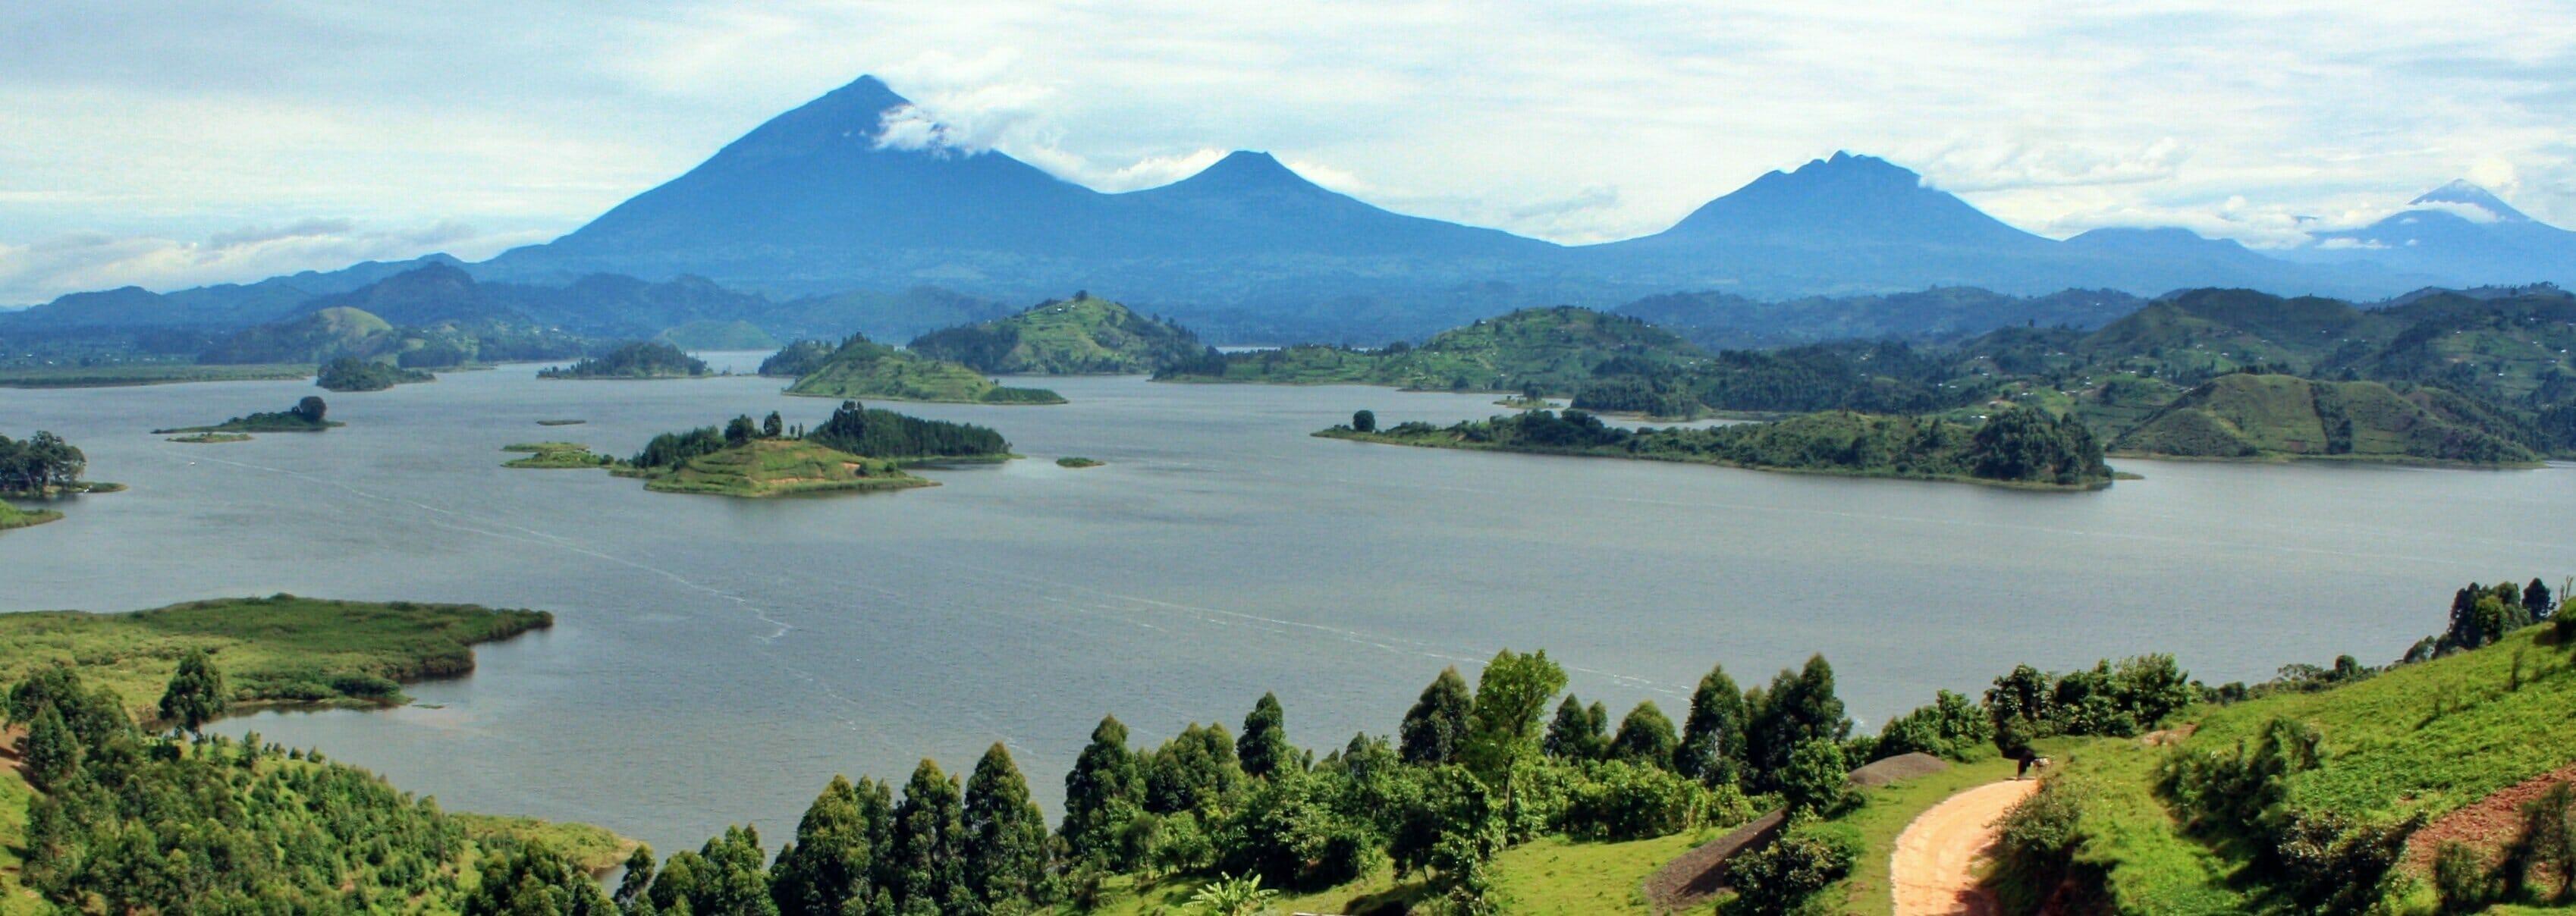 Wander- und Erlebnisreise Uganda und Ruanda